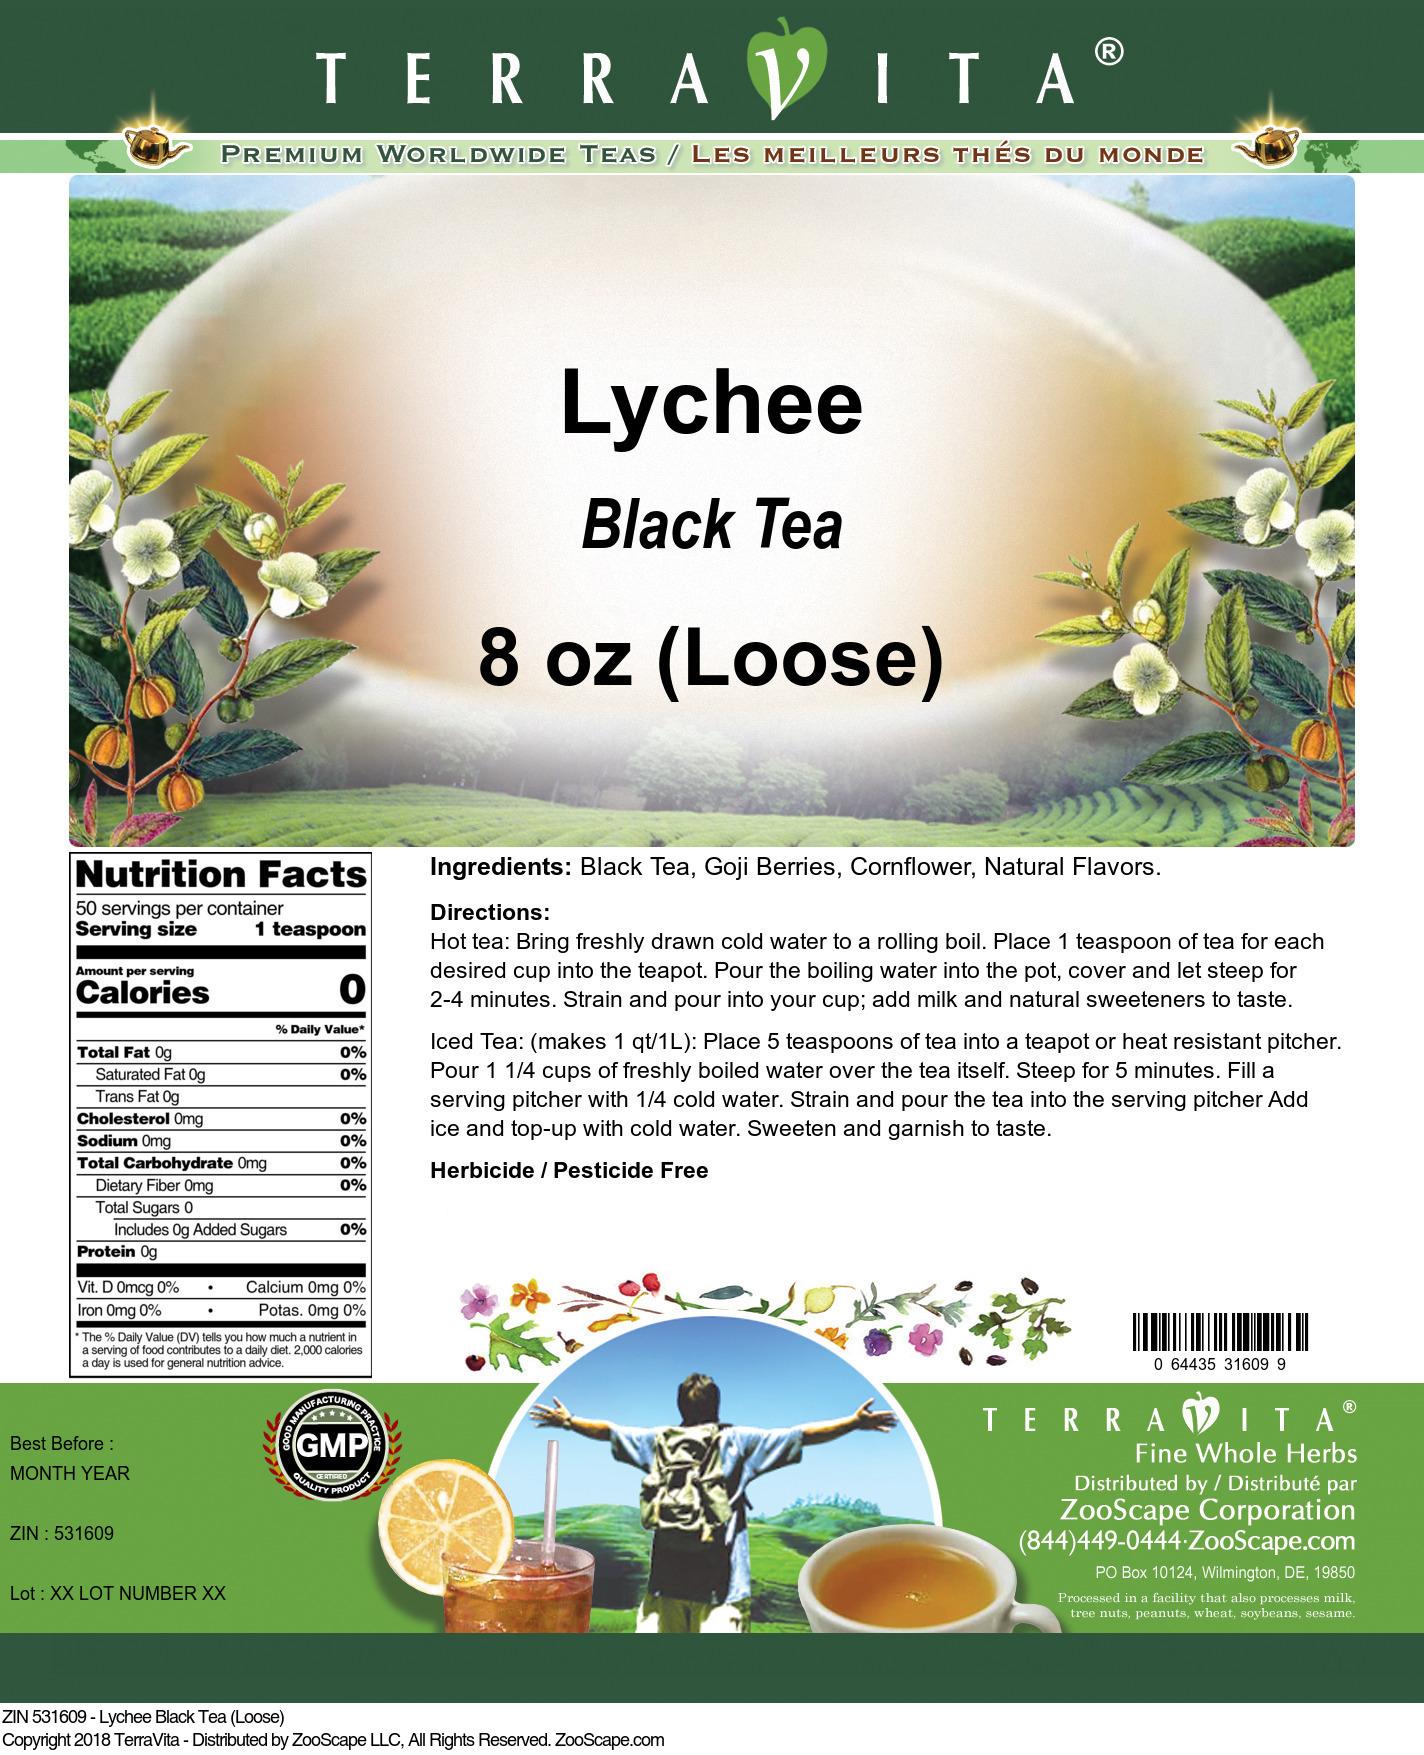 Lychee Black Tea (Loose)